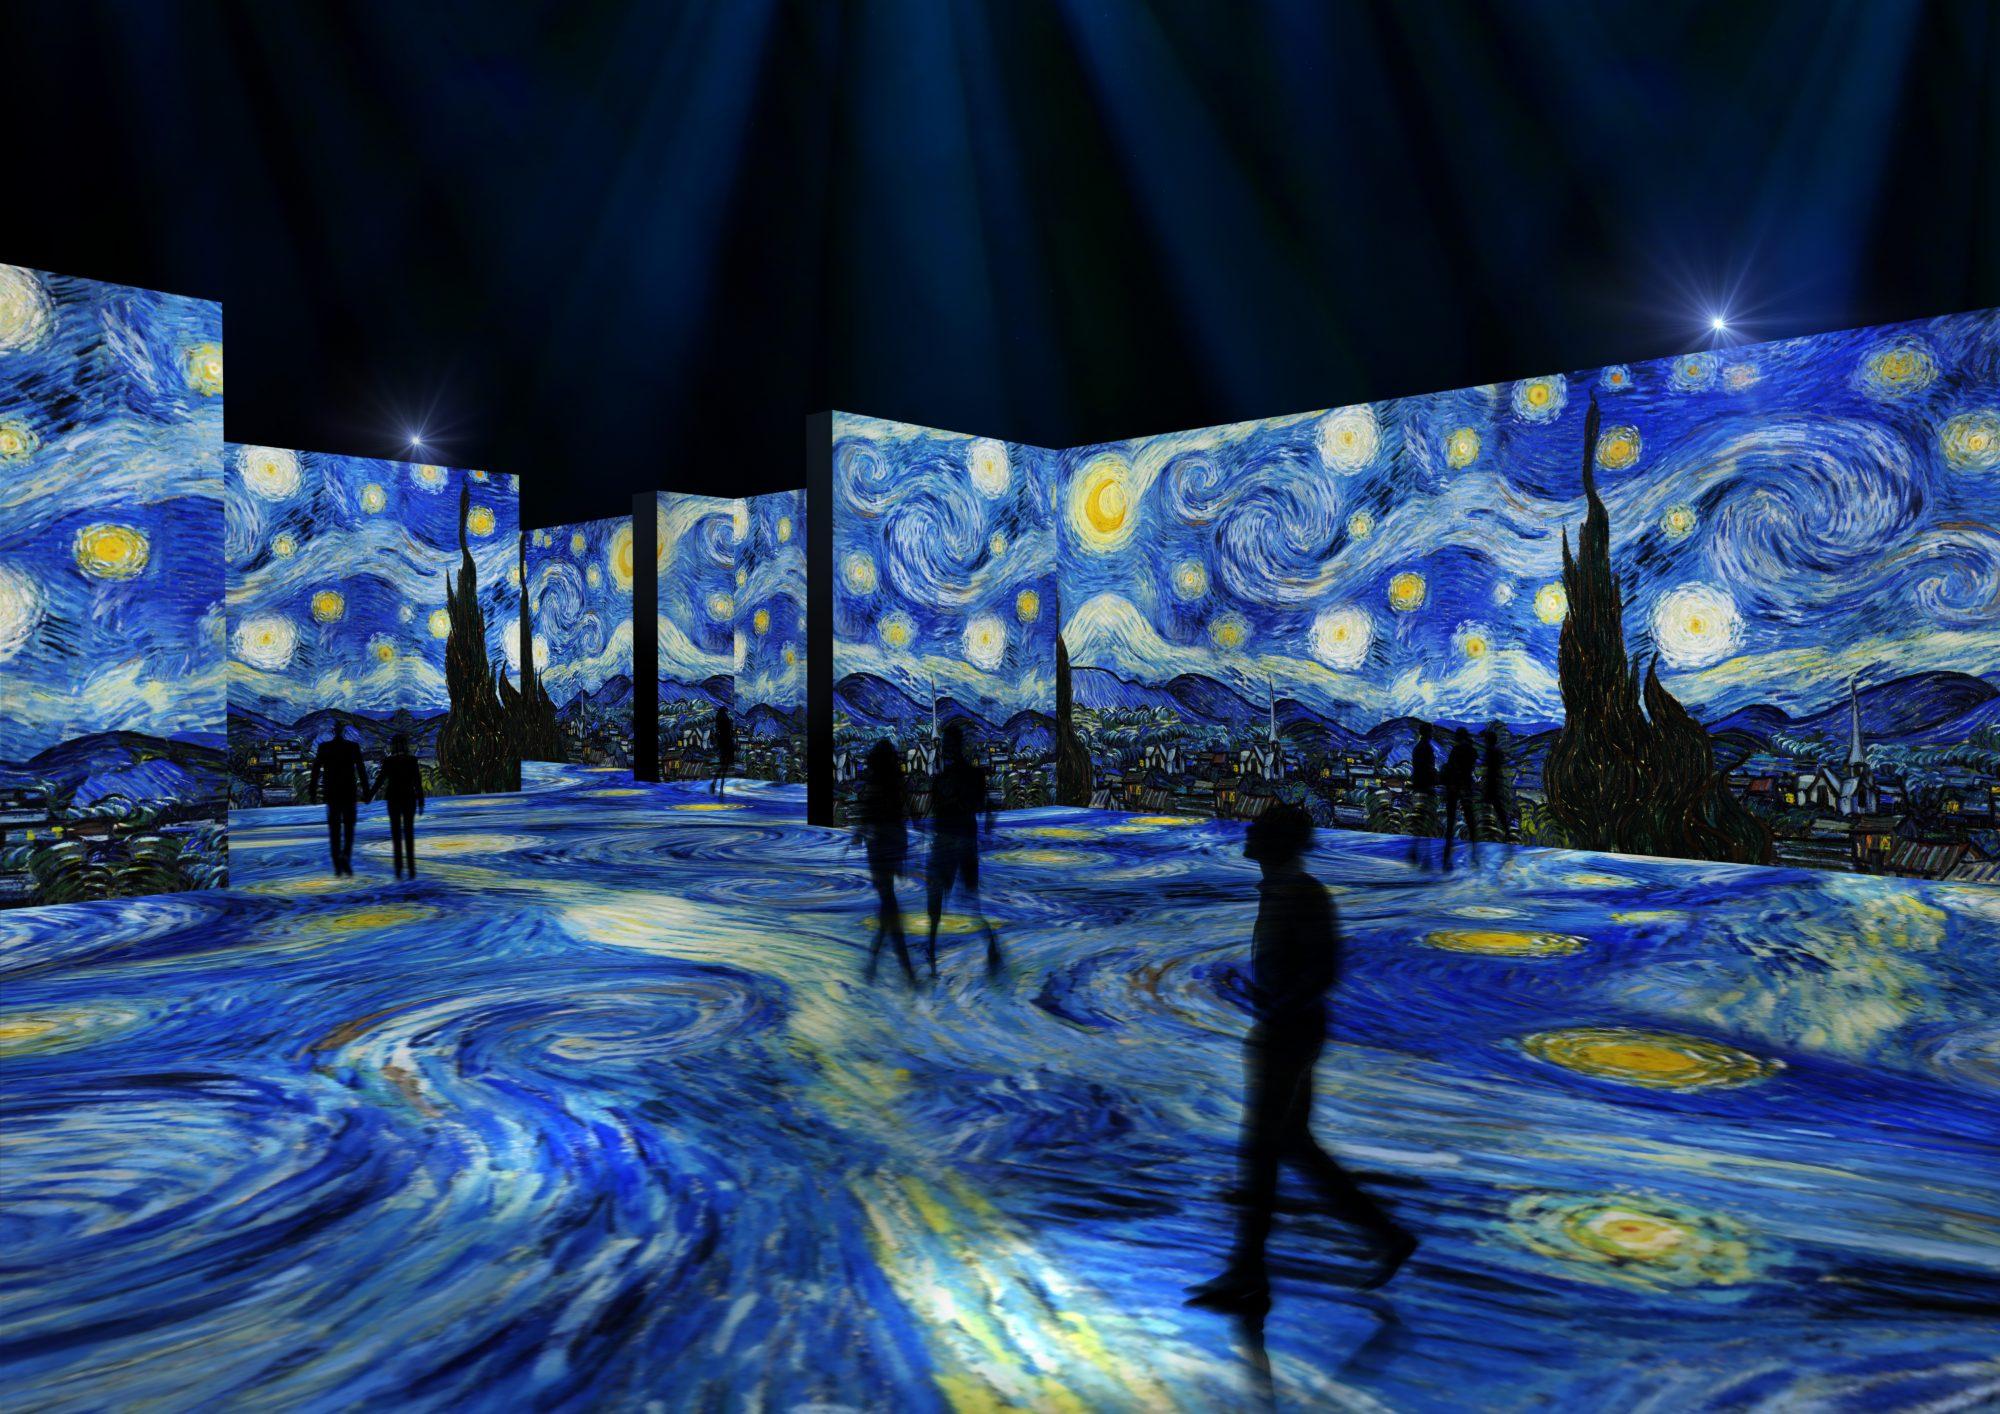 The LUME Indianapolis, immersive exhibit of Van Gogh's Starry Night